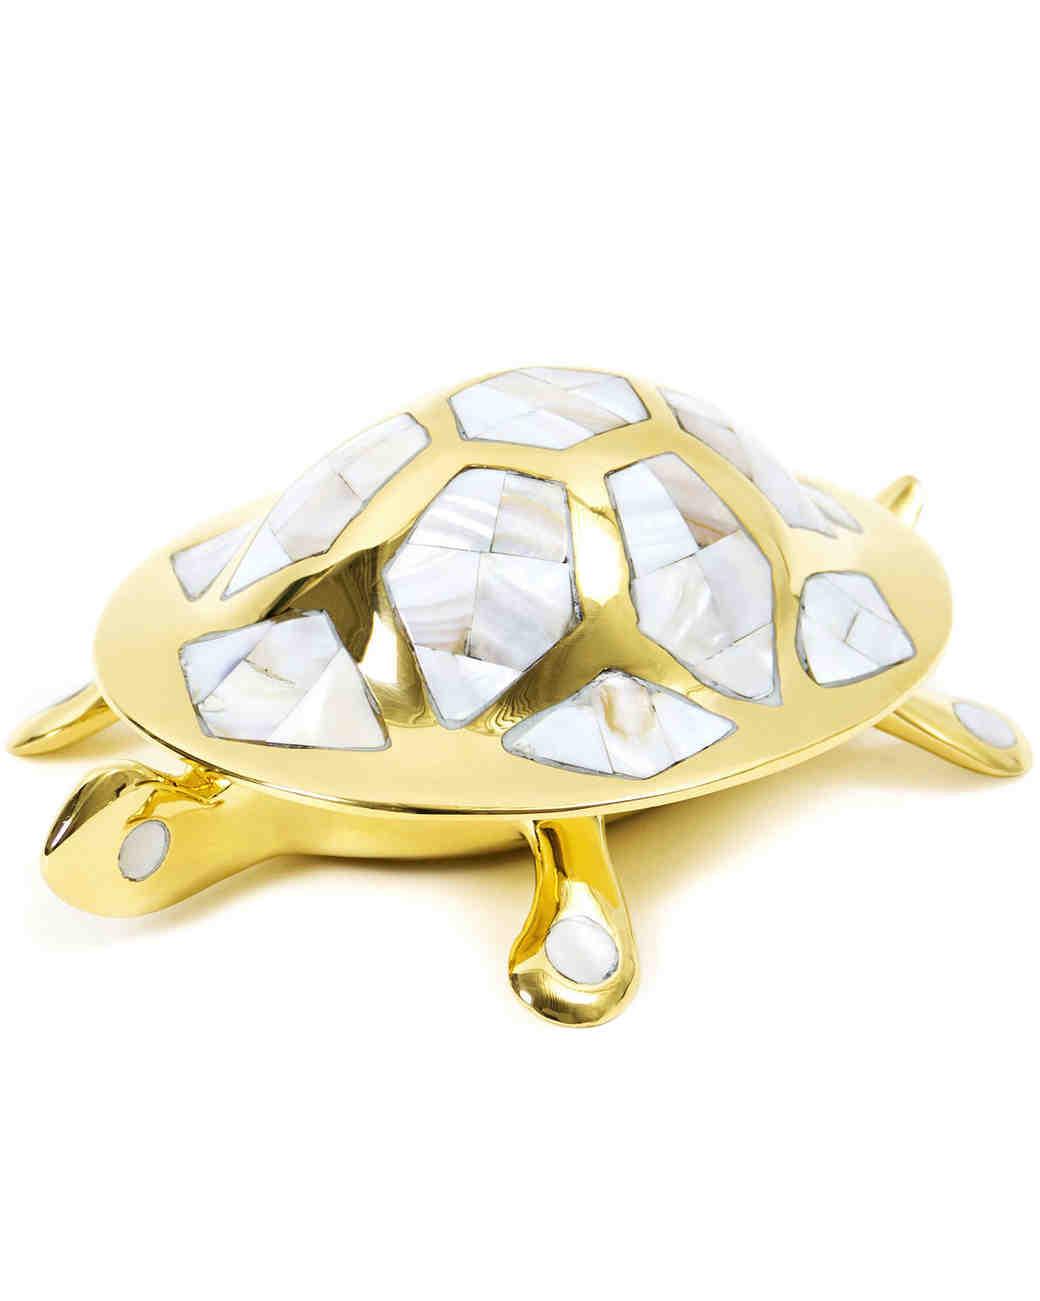 unique-ring-box-brass-turtle-0316.jpg